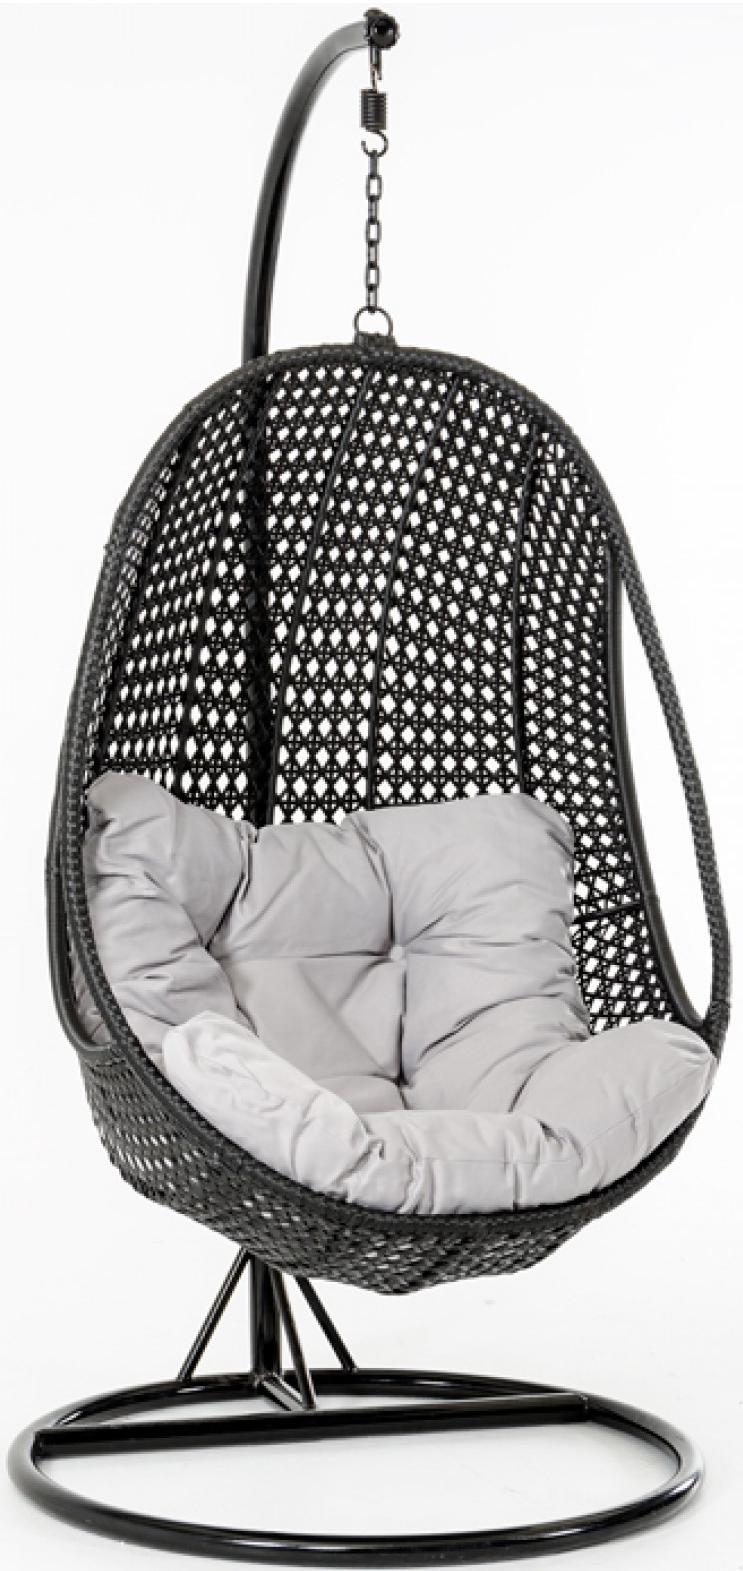 Sardinia Rattan Pod Hanging Chair | Outdoor Patio Furniture